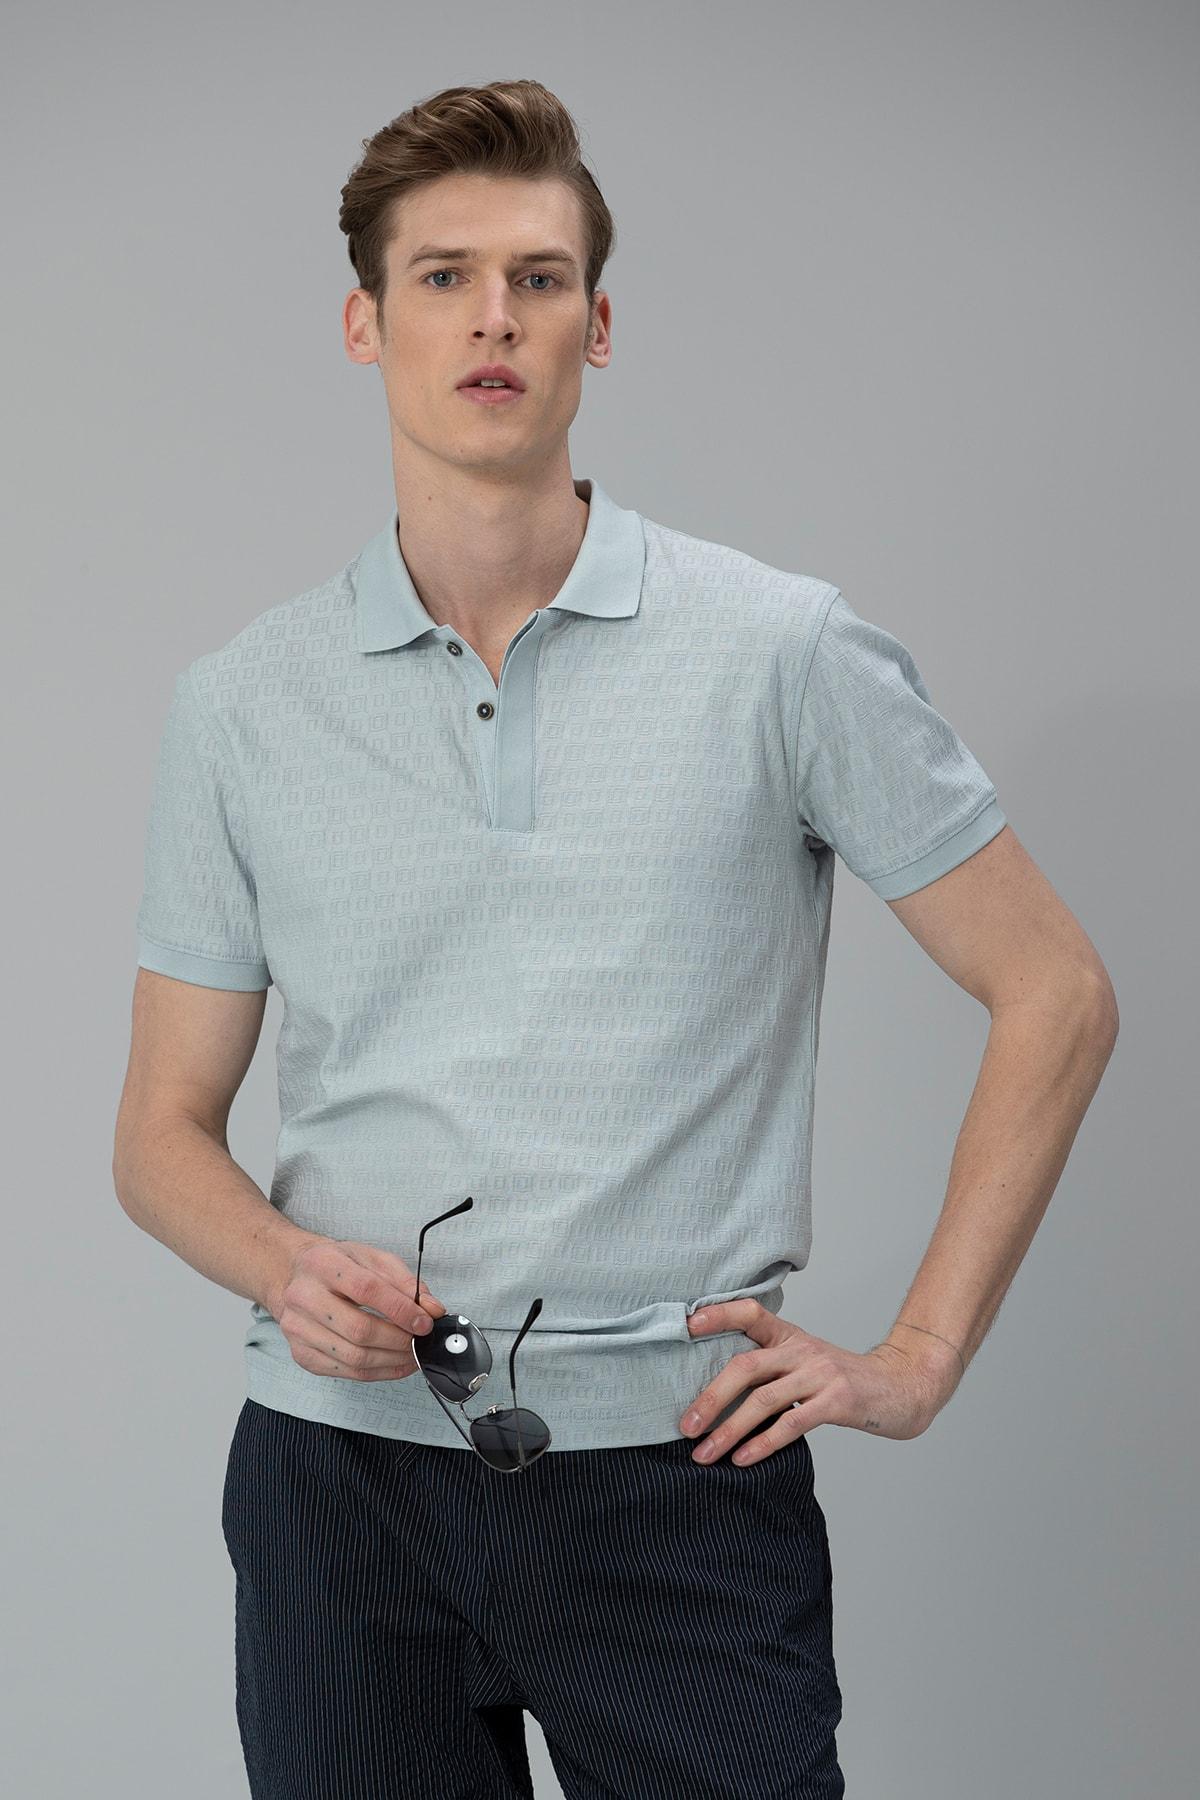 Lufian Clar Spor Polo T- Shirt Açık Nane 0